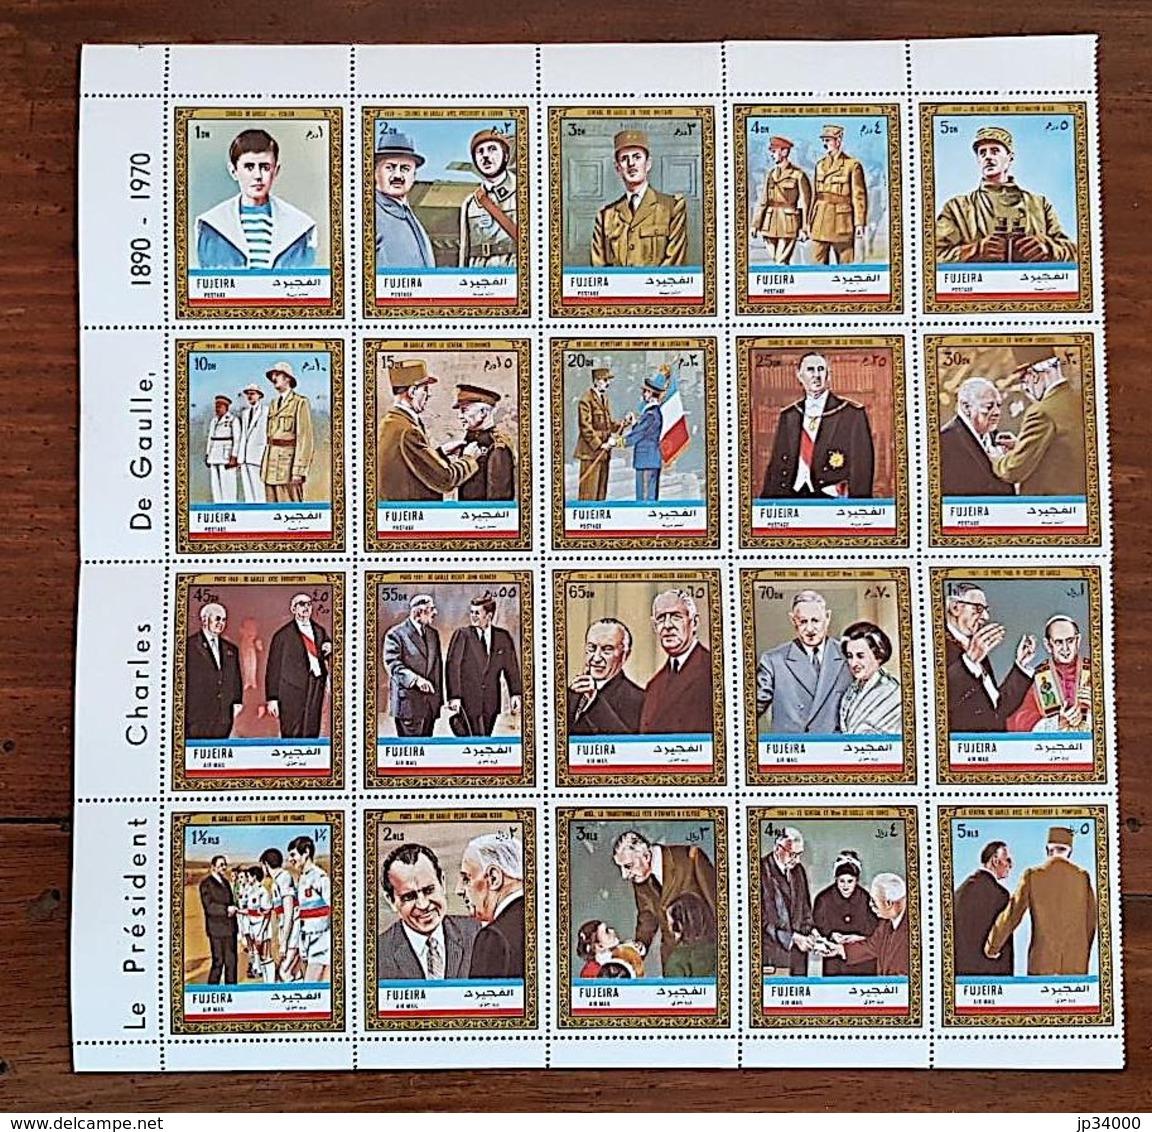 FUJEIRA DE Gaulle. N° Michel N° 936 / 955 A Complet DENTELE (perf). Neuf Sans Charniere. (MNH) - De Gaulle (General)